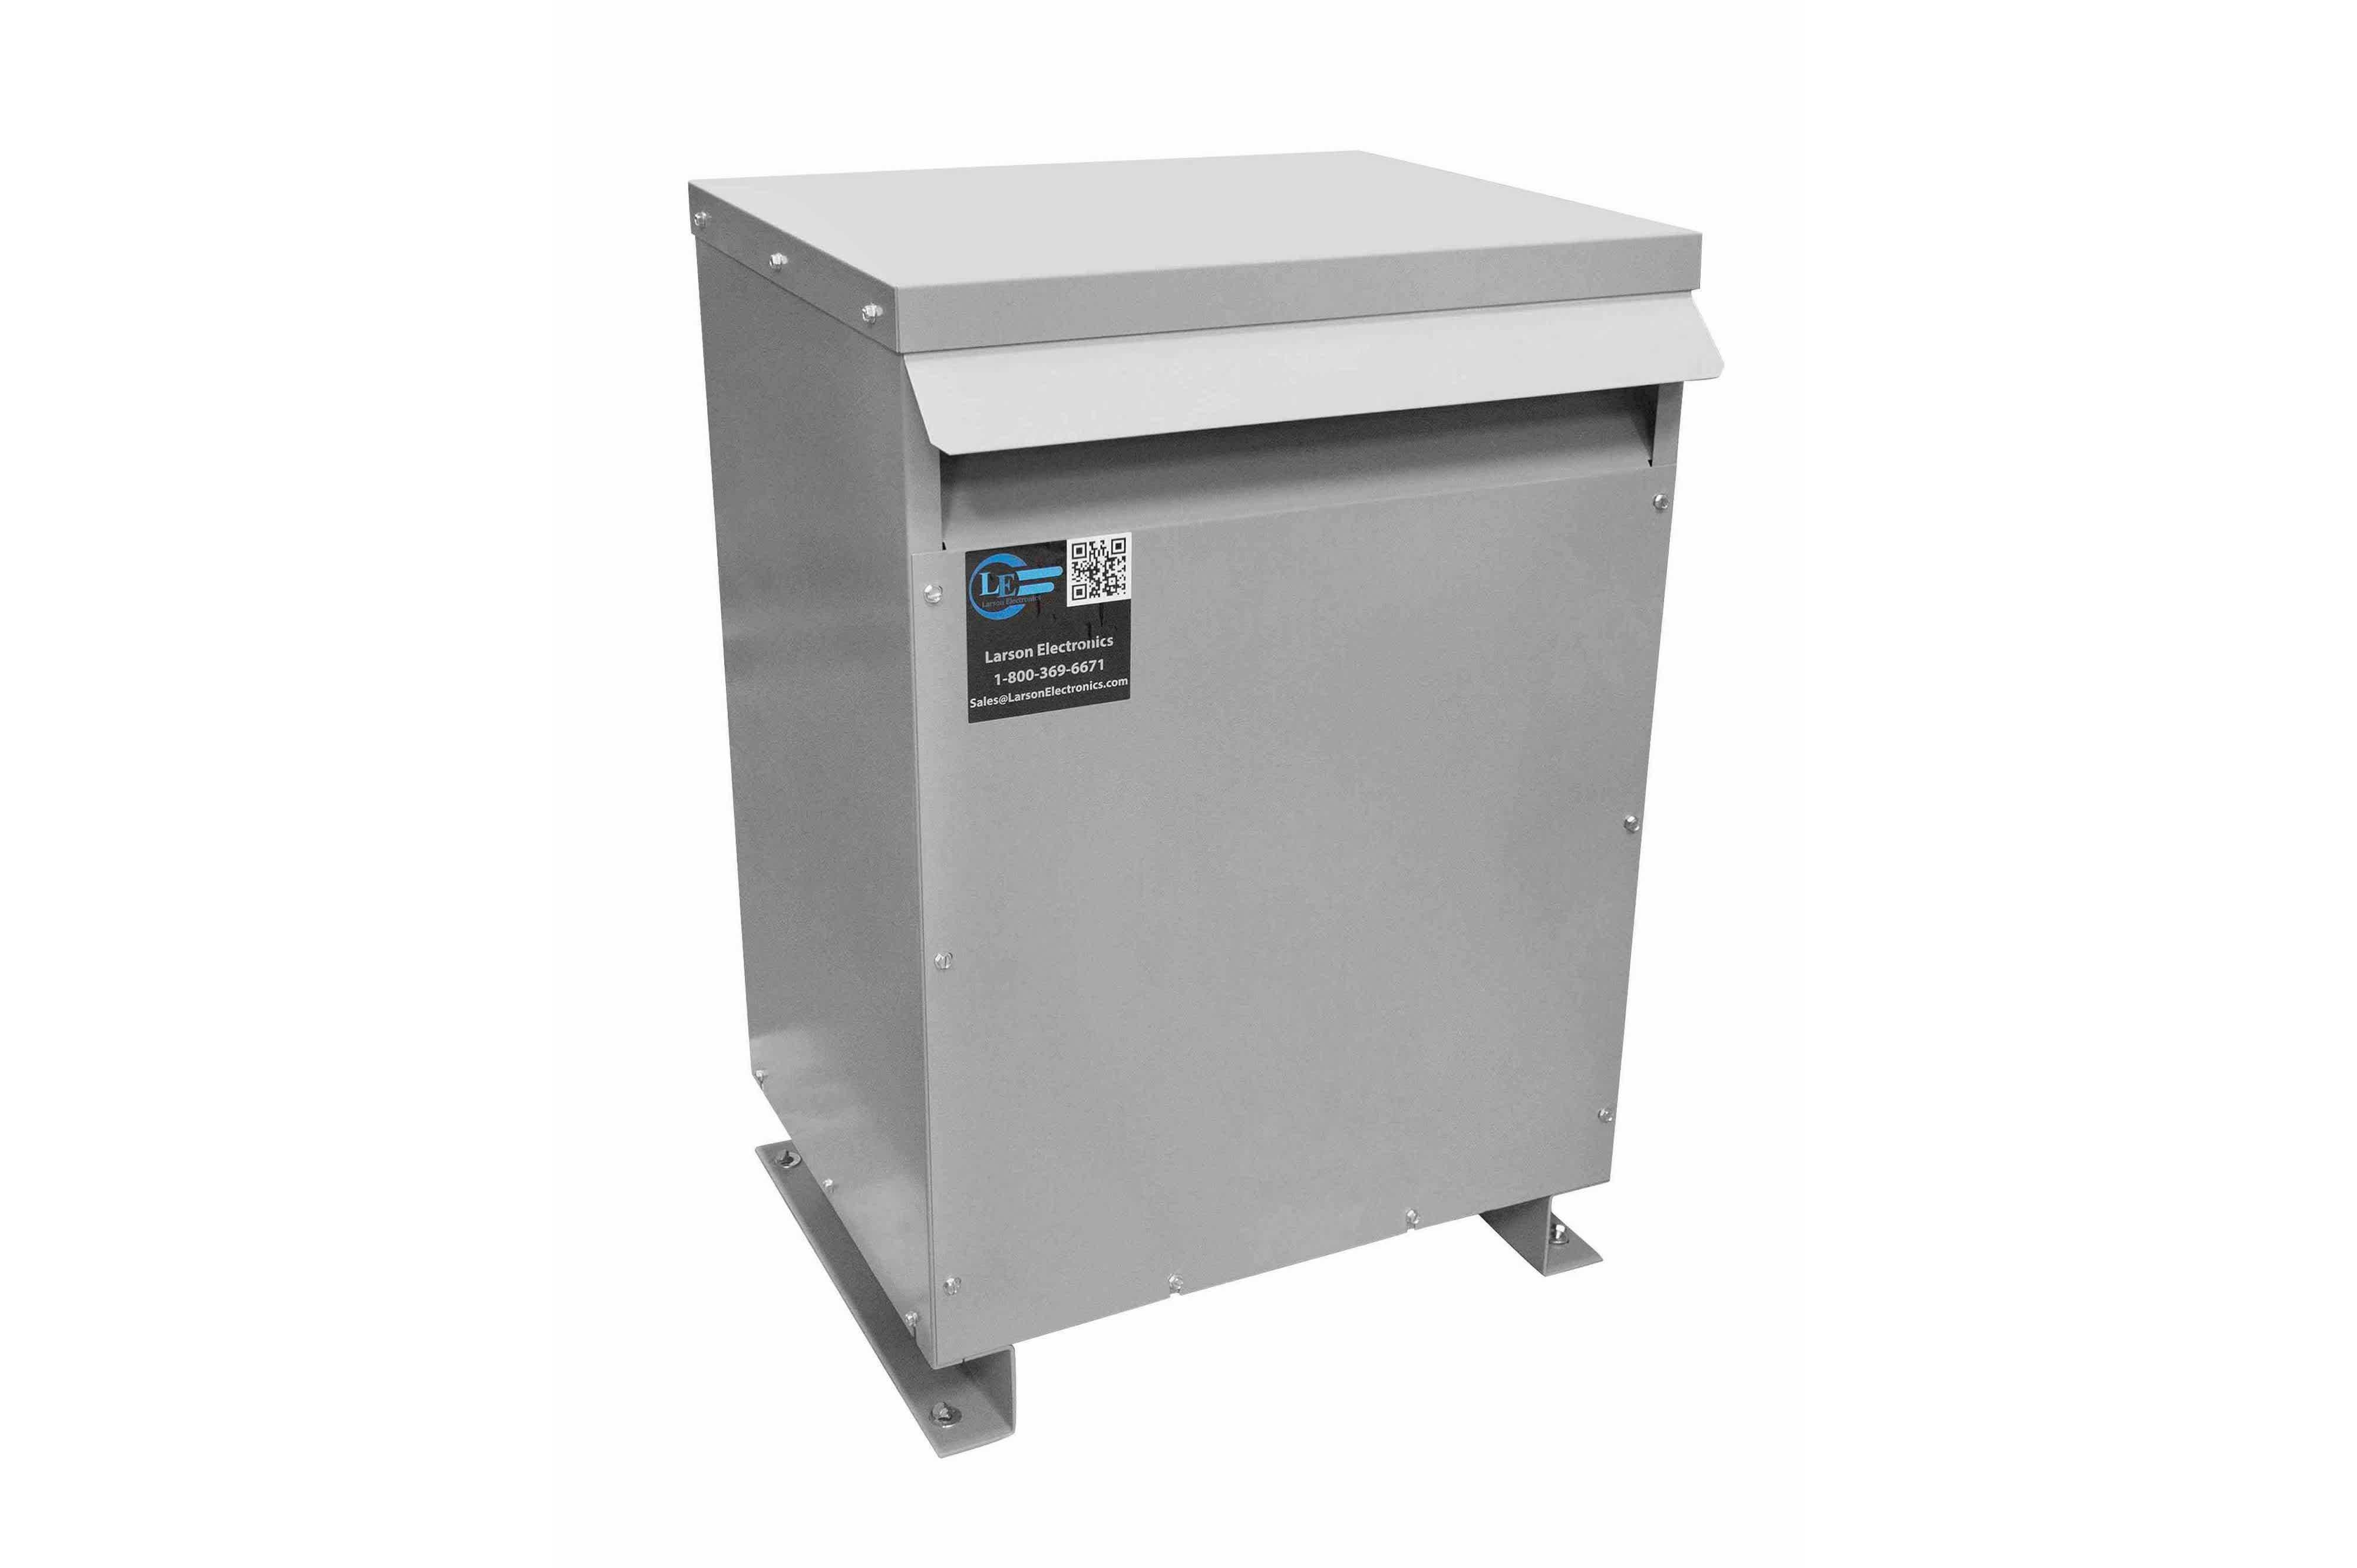 100 kVA 3PH DOE Transformer, 460V Delta Primary, 400Y/231 Wye-N Secondary, N3R, Ventilated, 60 Hz